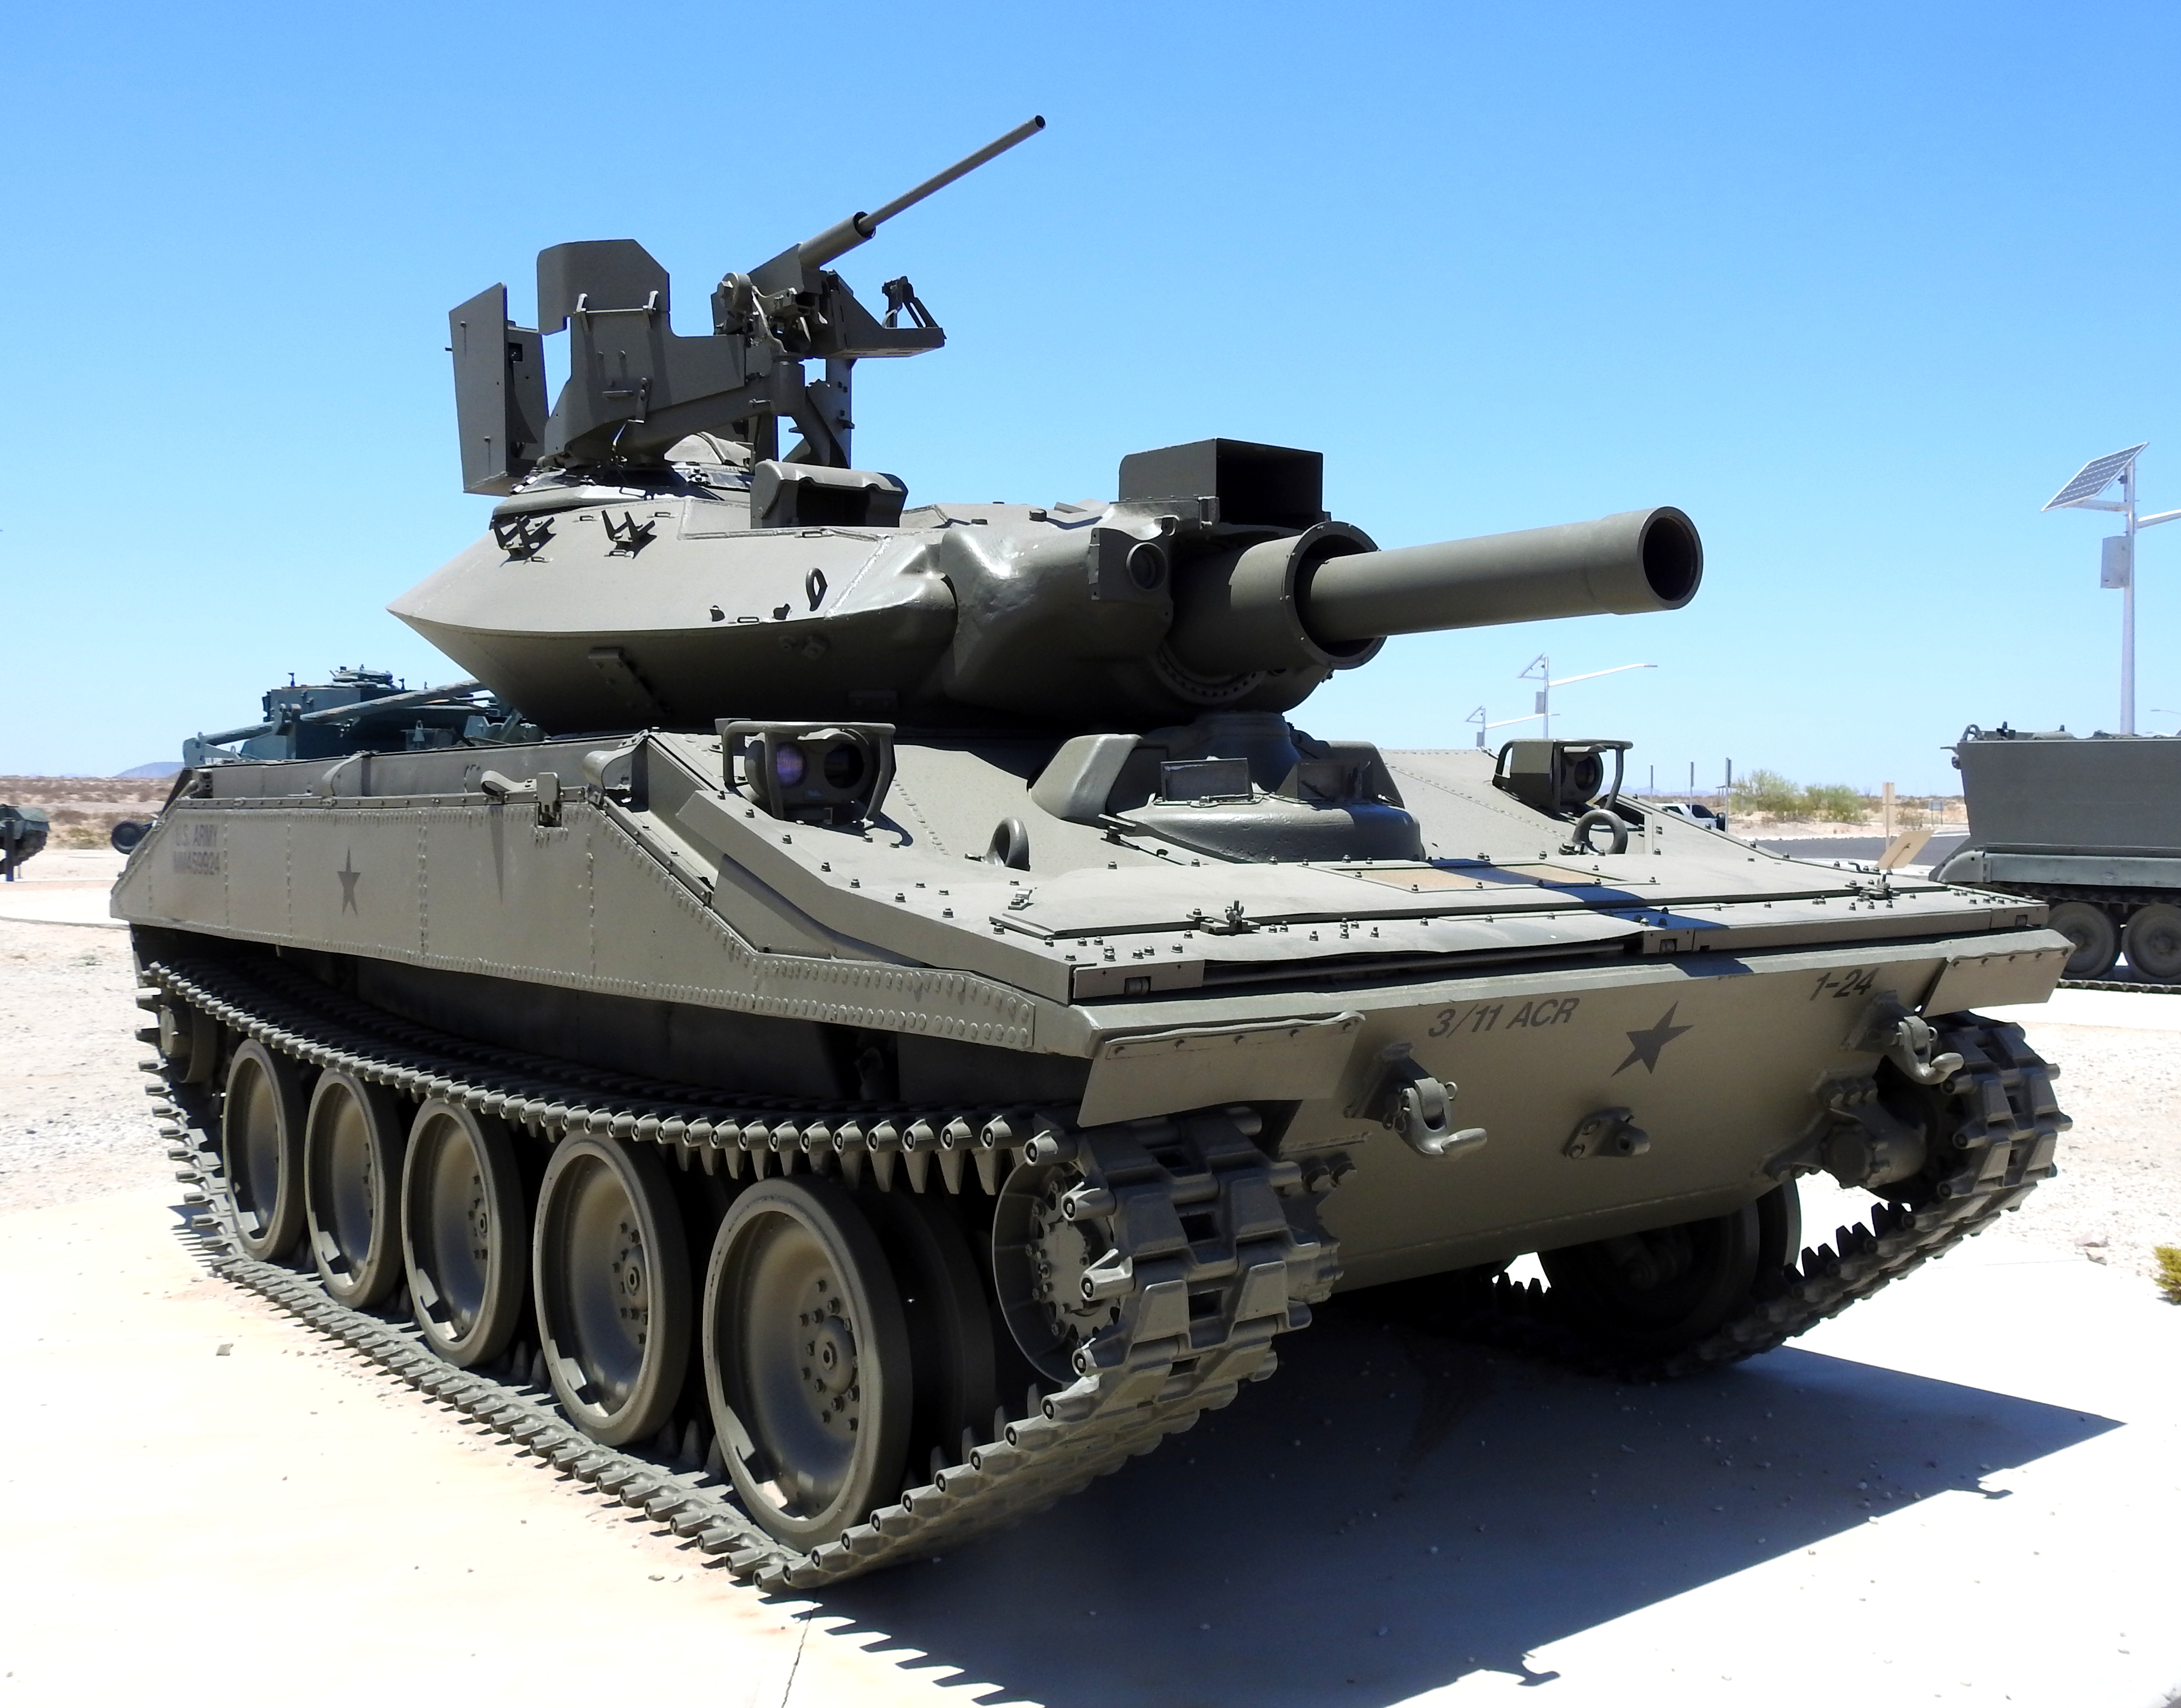 39 Germany 1994 1:72 Carro/Panzer/Tanks/Military PALADIN S.P HOWITZER